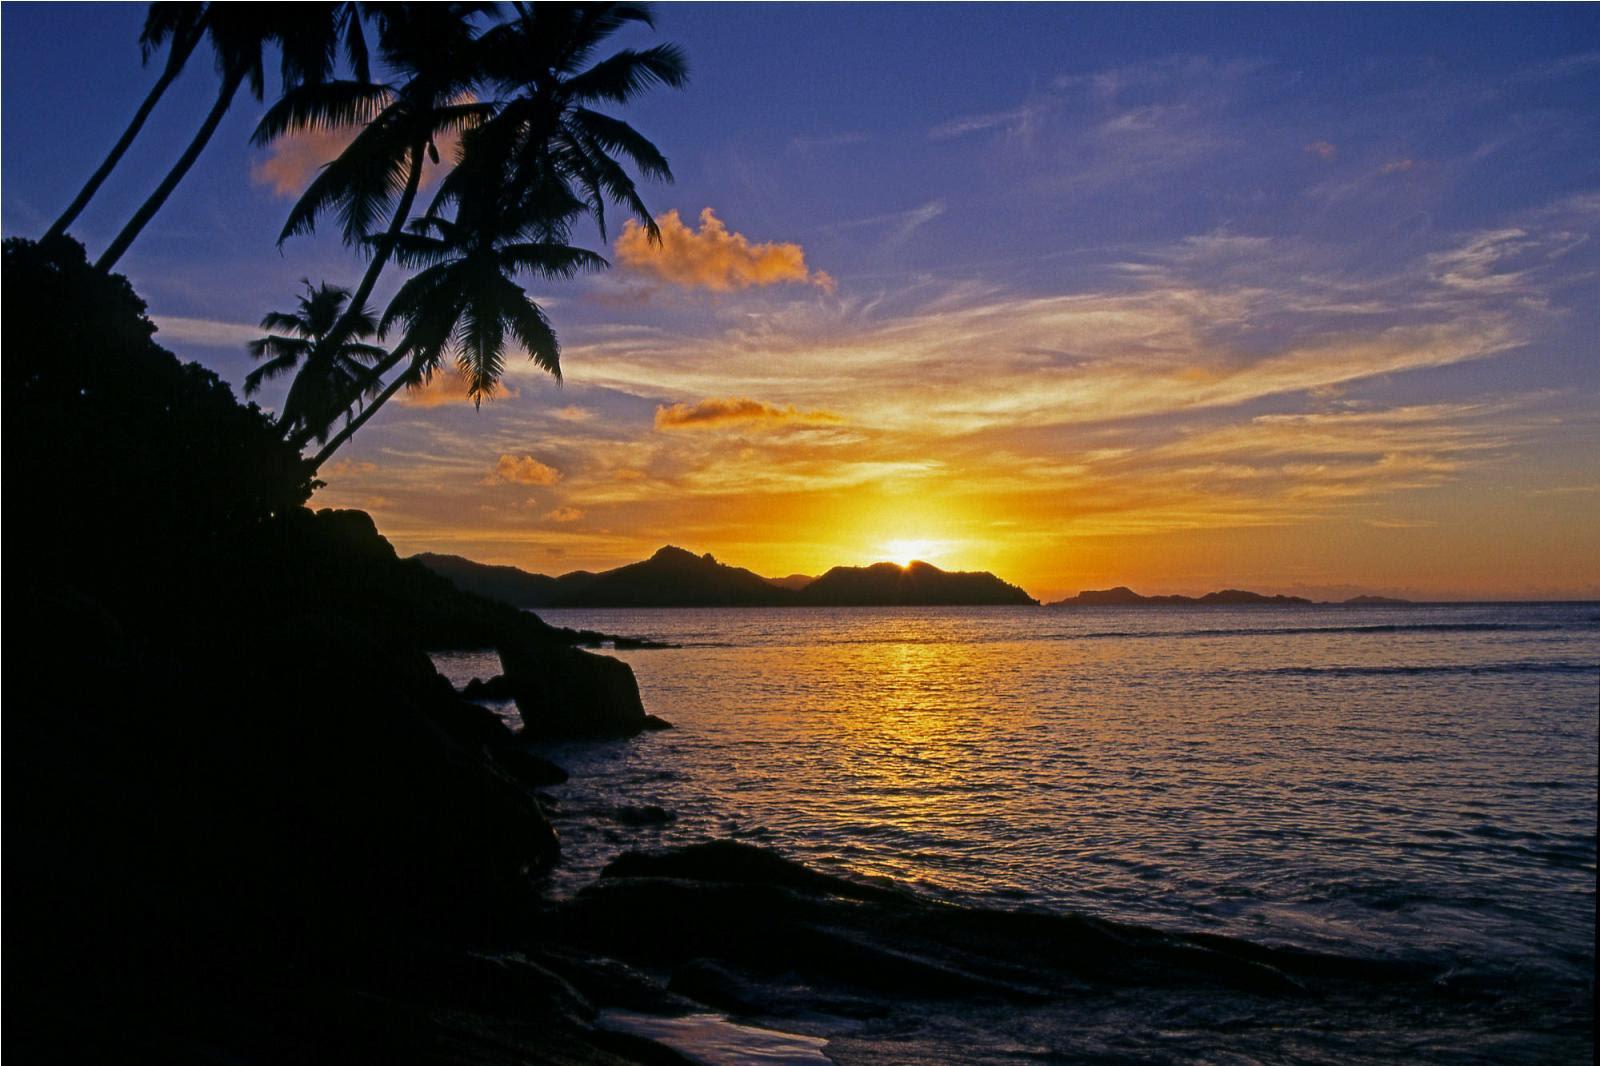 http://www.worldalldetails.com/article_image/seychelles_islands_africa_029016.jpg